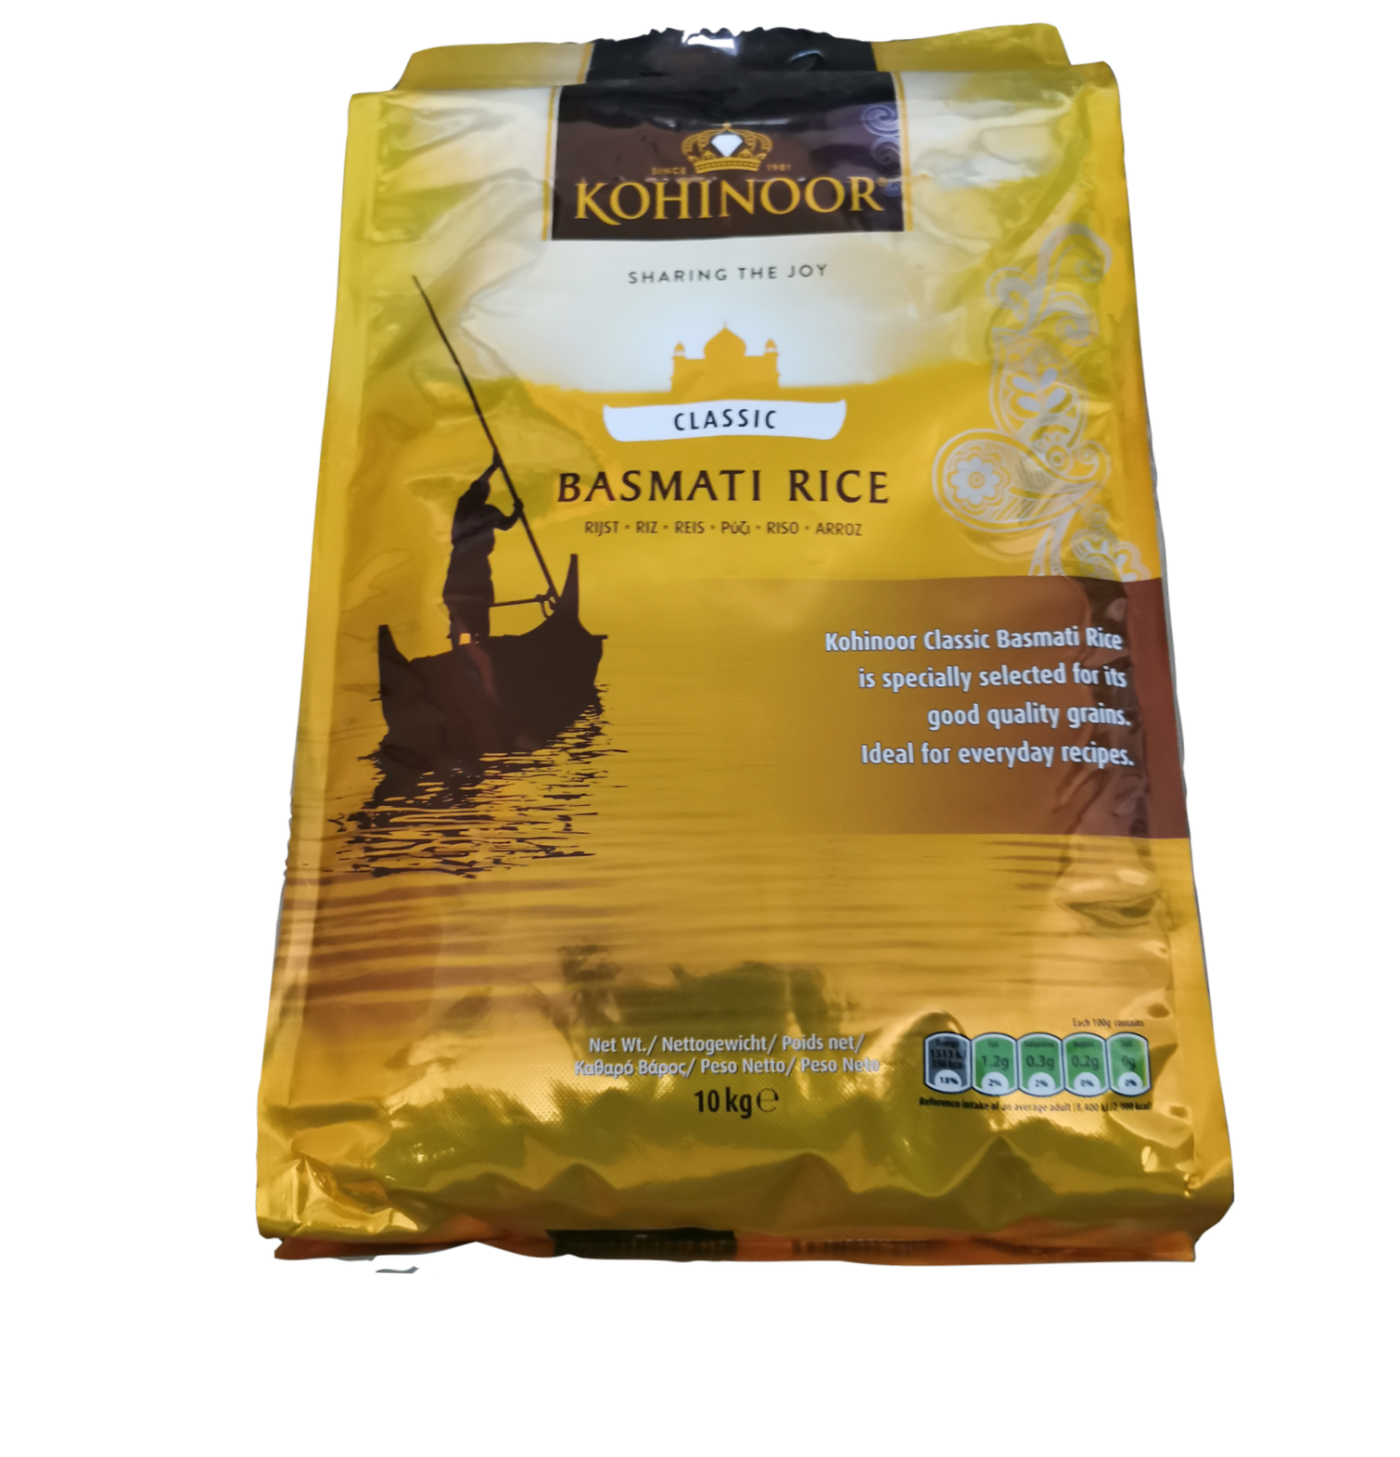 Kohinoor Basmati Rice (Classic)